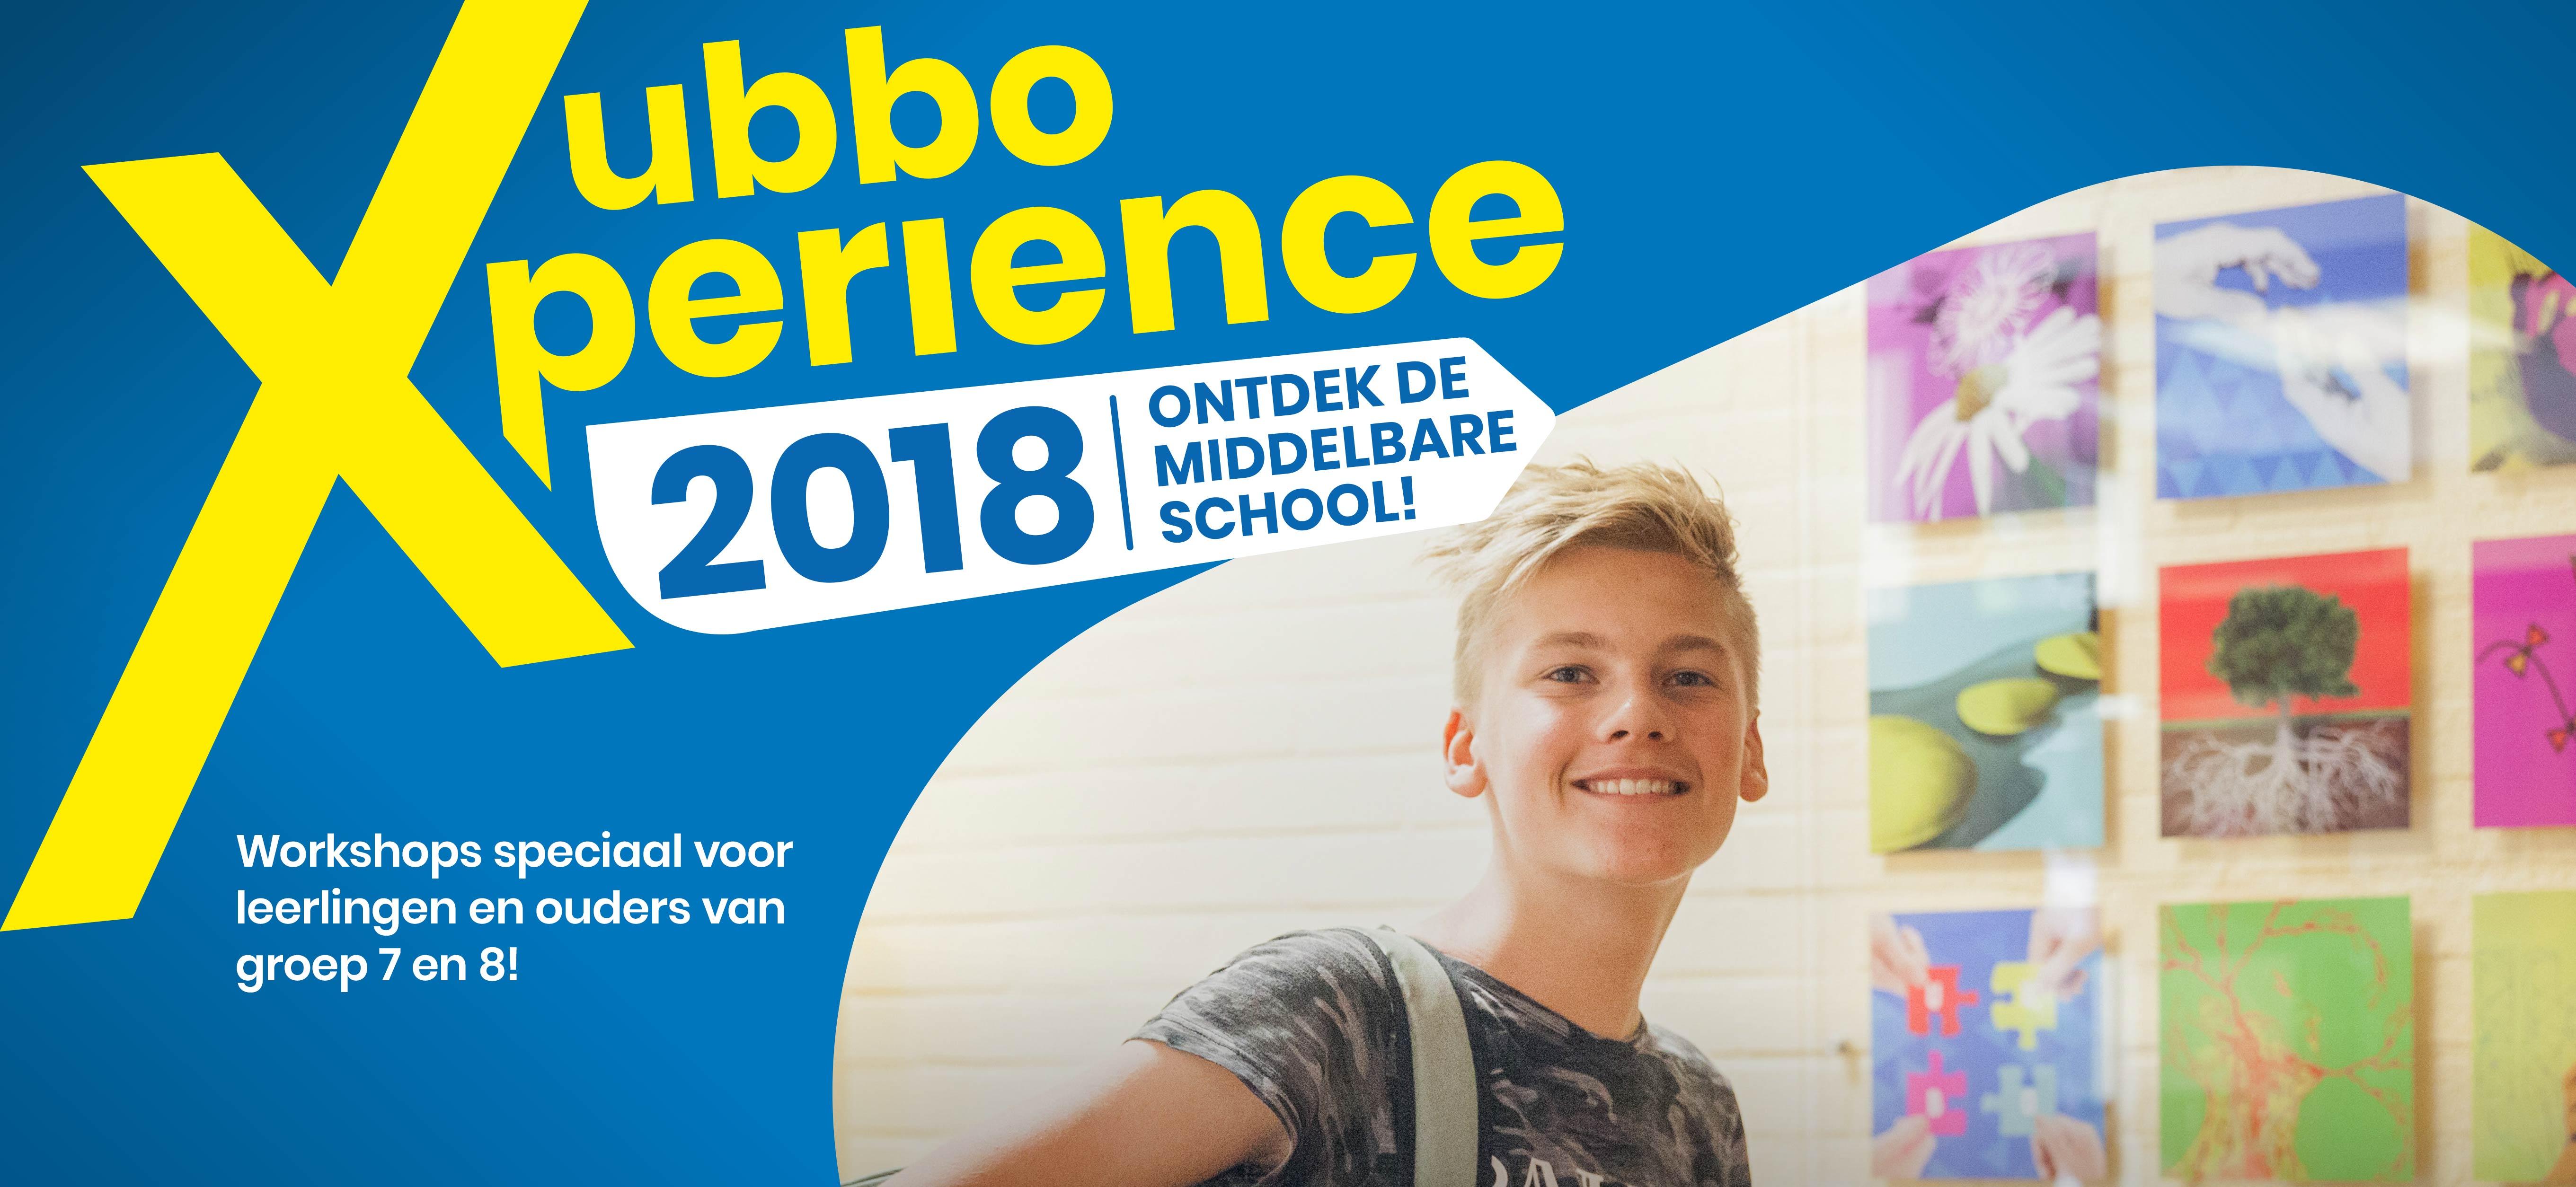 https://www.ubboemmius.nl/wp-content/uploads/2018/10/20181002_ubboemmius_ubboxperience_online_campagne_PAGINA_HEADER_1920x885px-1.jpg